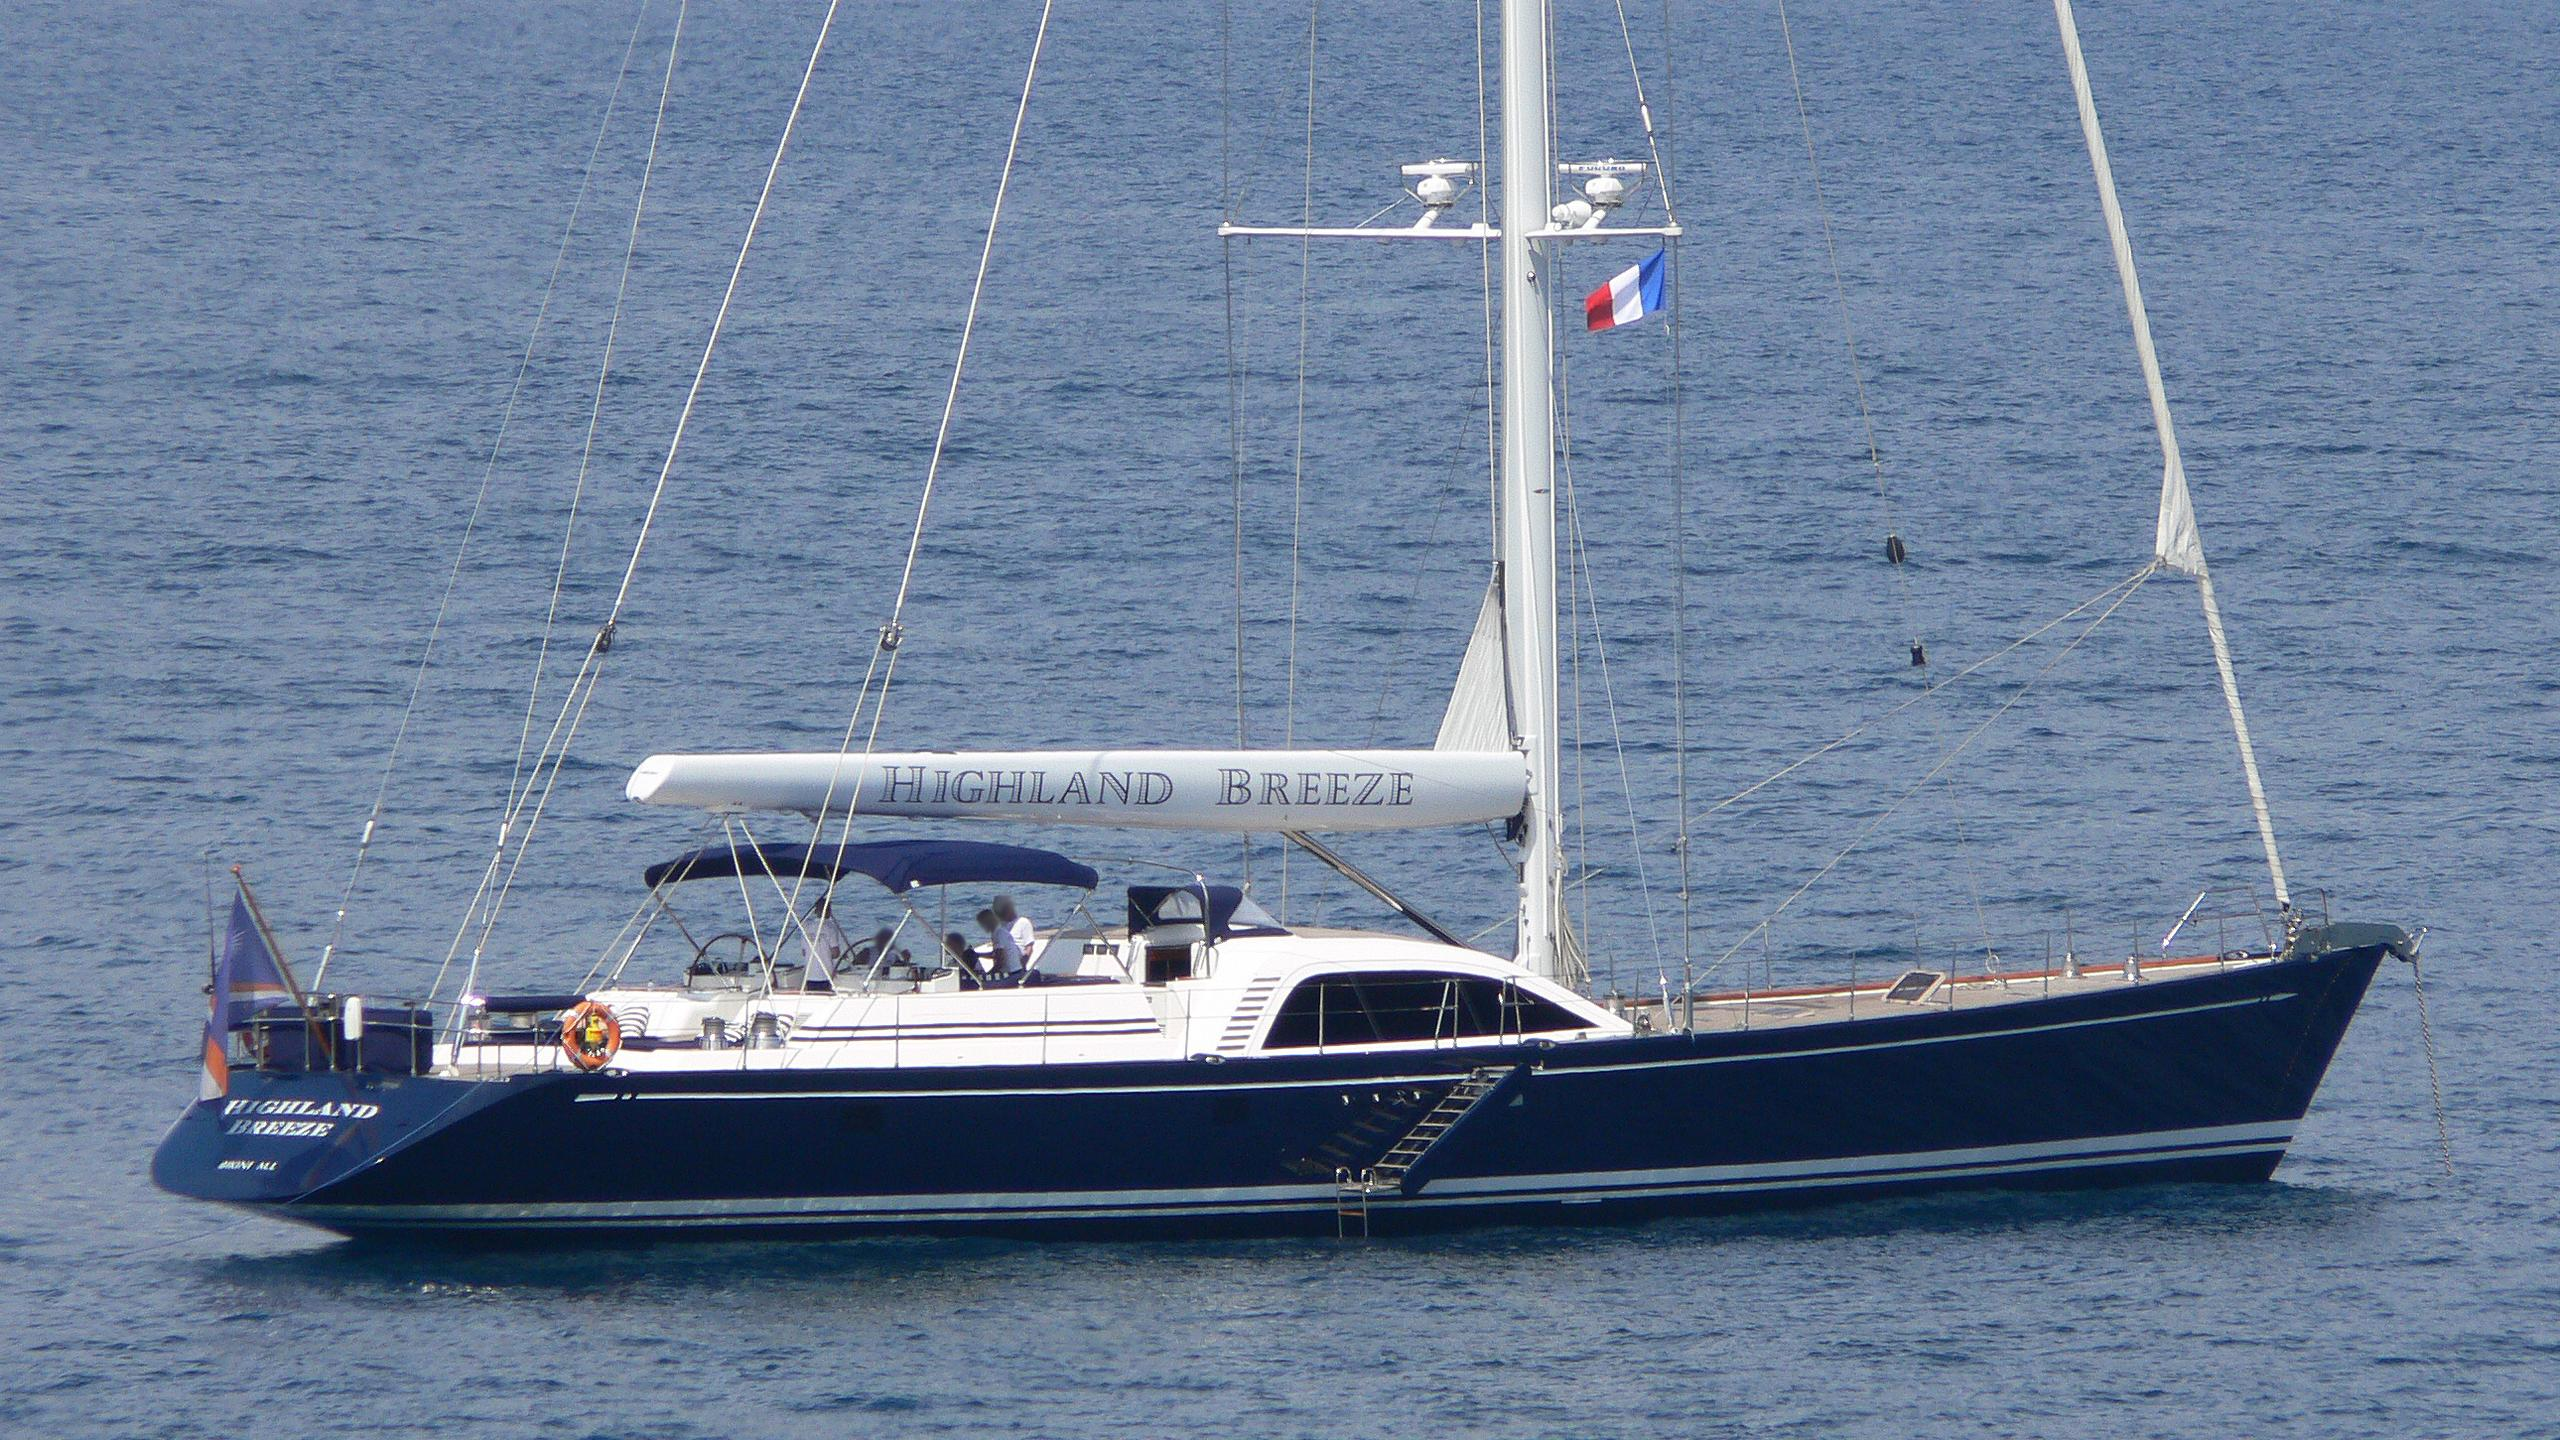 fruition ii highland breeze sailing yacht nautors swan 35m 2003 profile